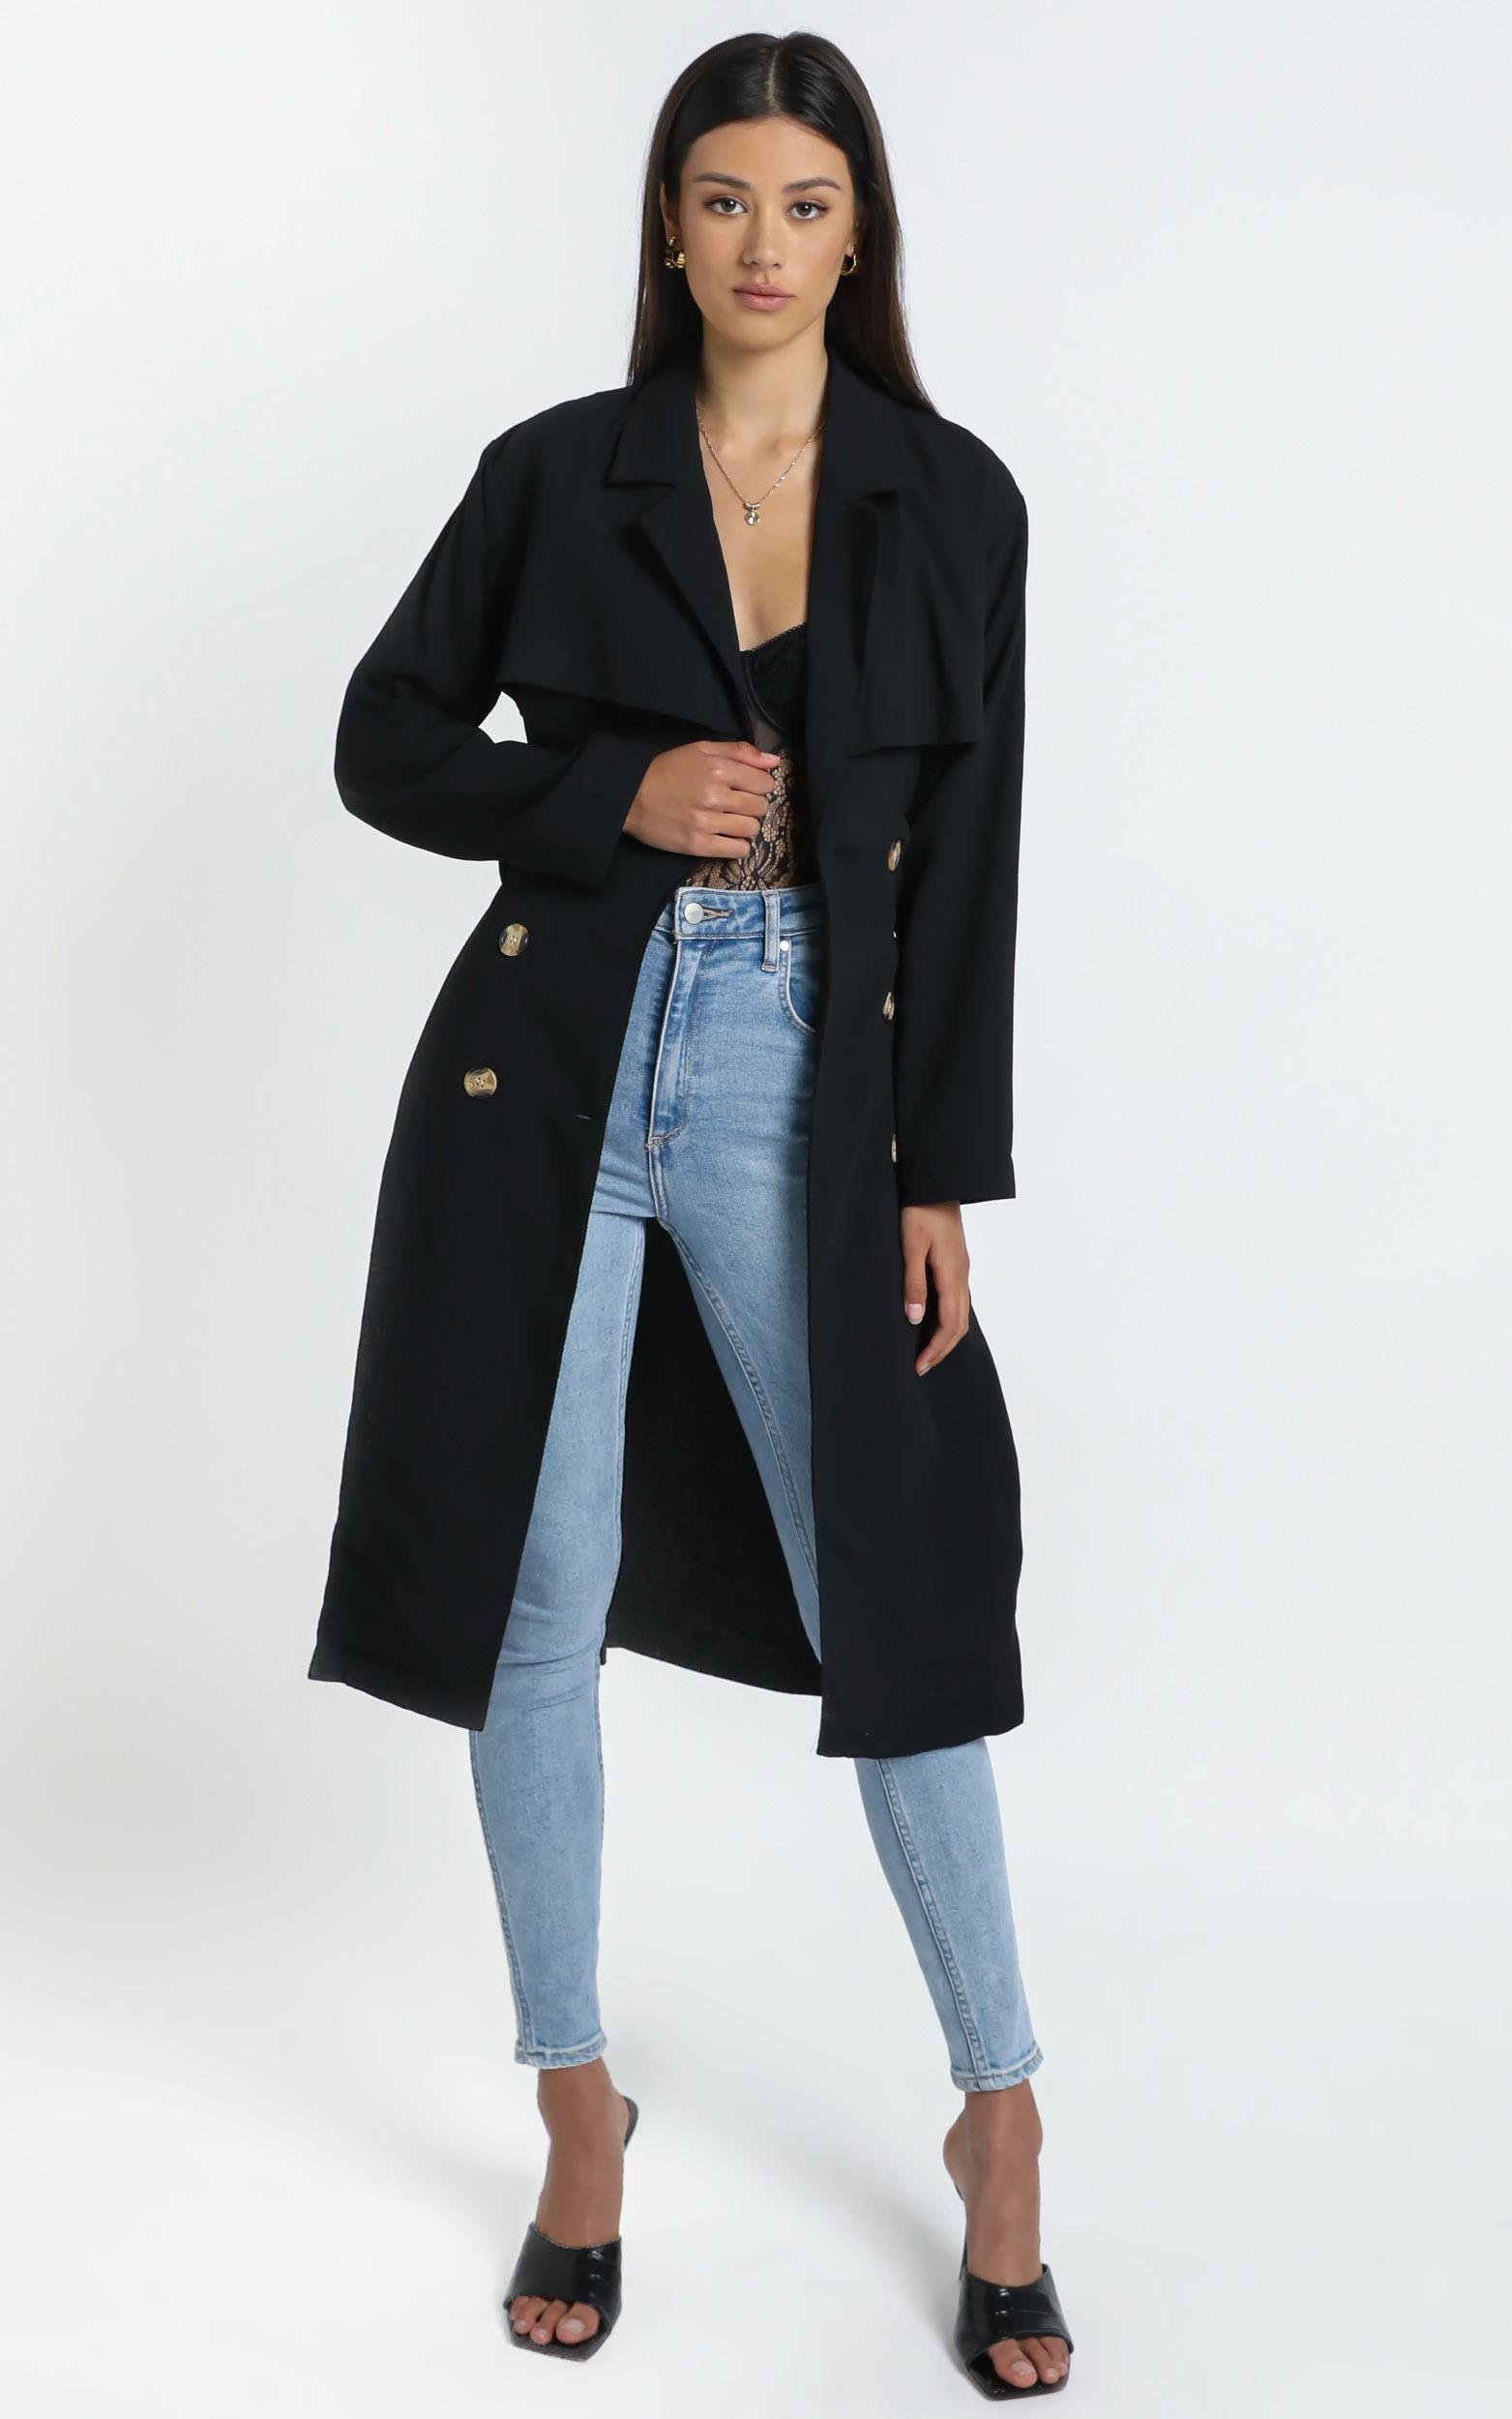 Lana Trench Coat in Black - 14 (XL), Black, hi-res image number null